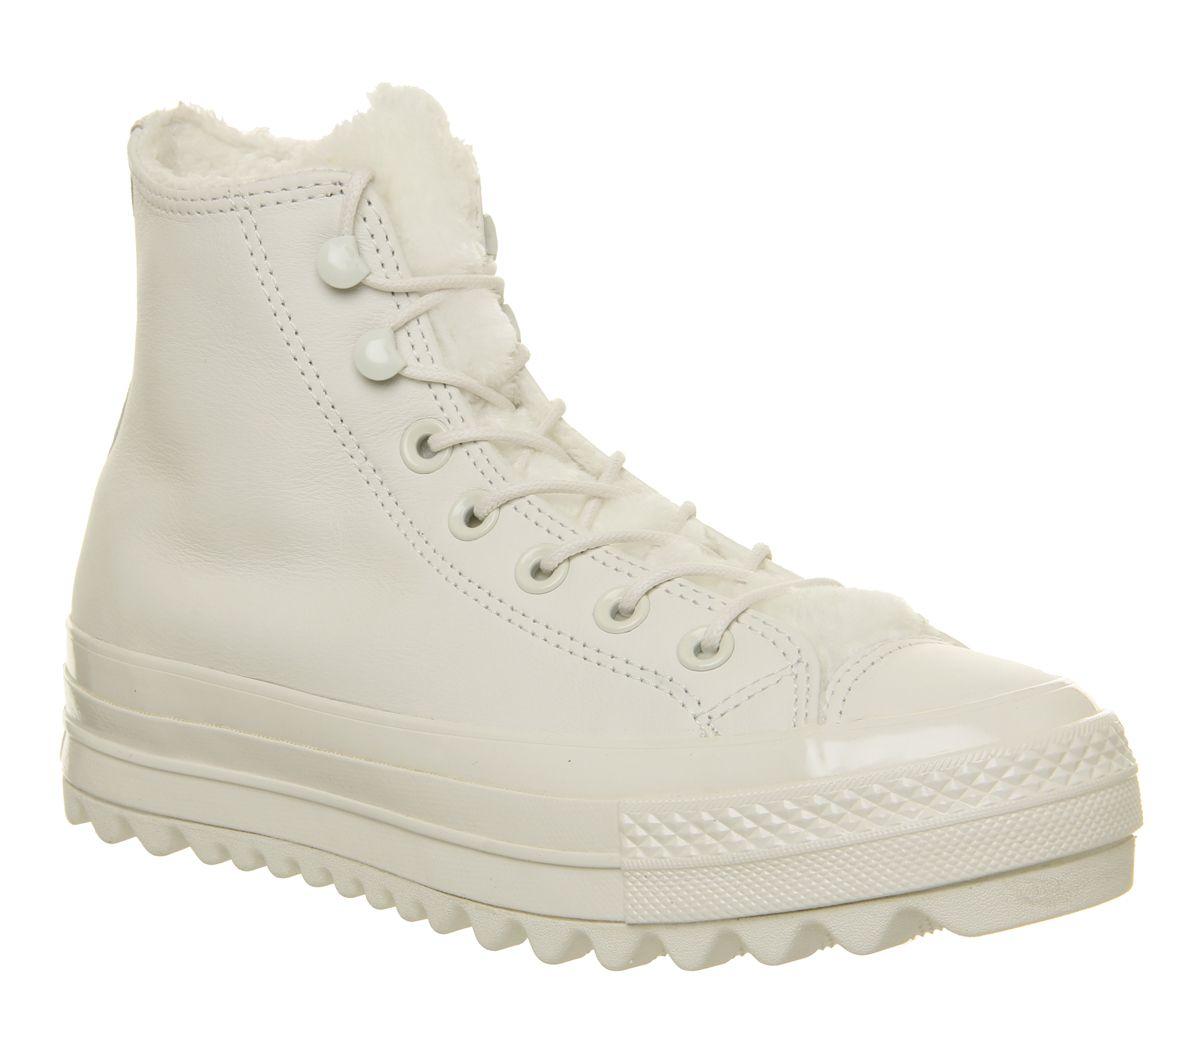 1ec0a0beeaed7e Converse Chuck Taylor All Star Lift Ripple Hi Trainers Vintage White ...